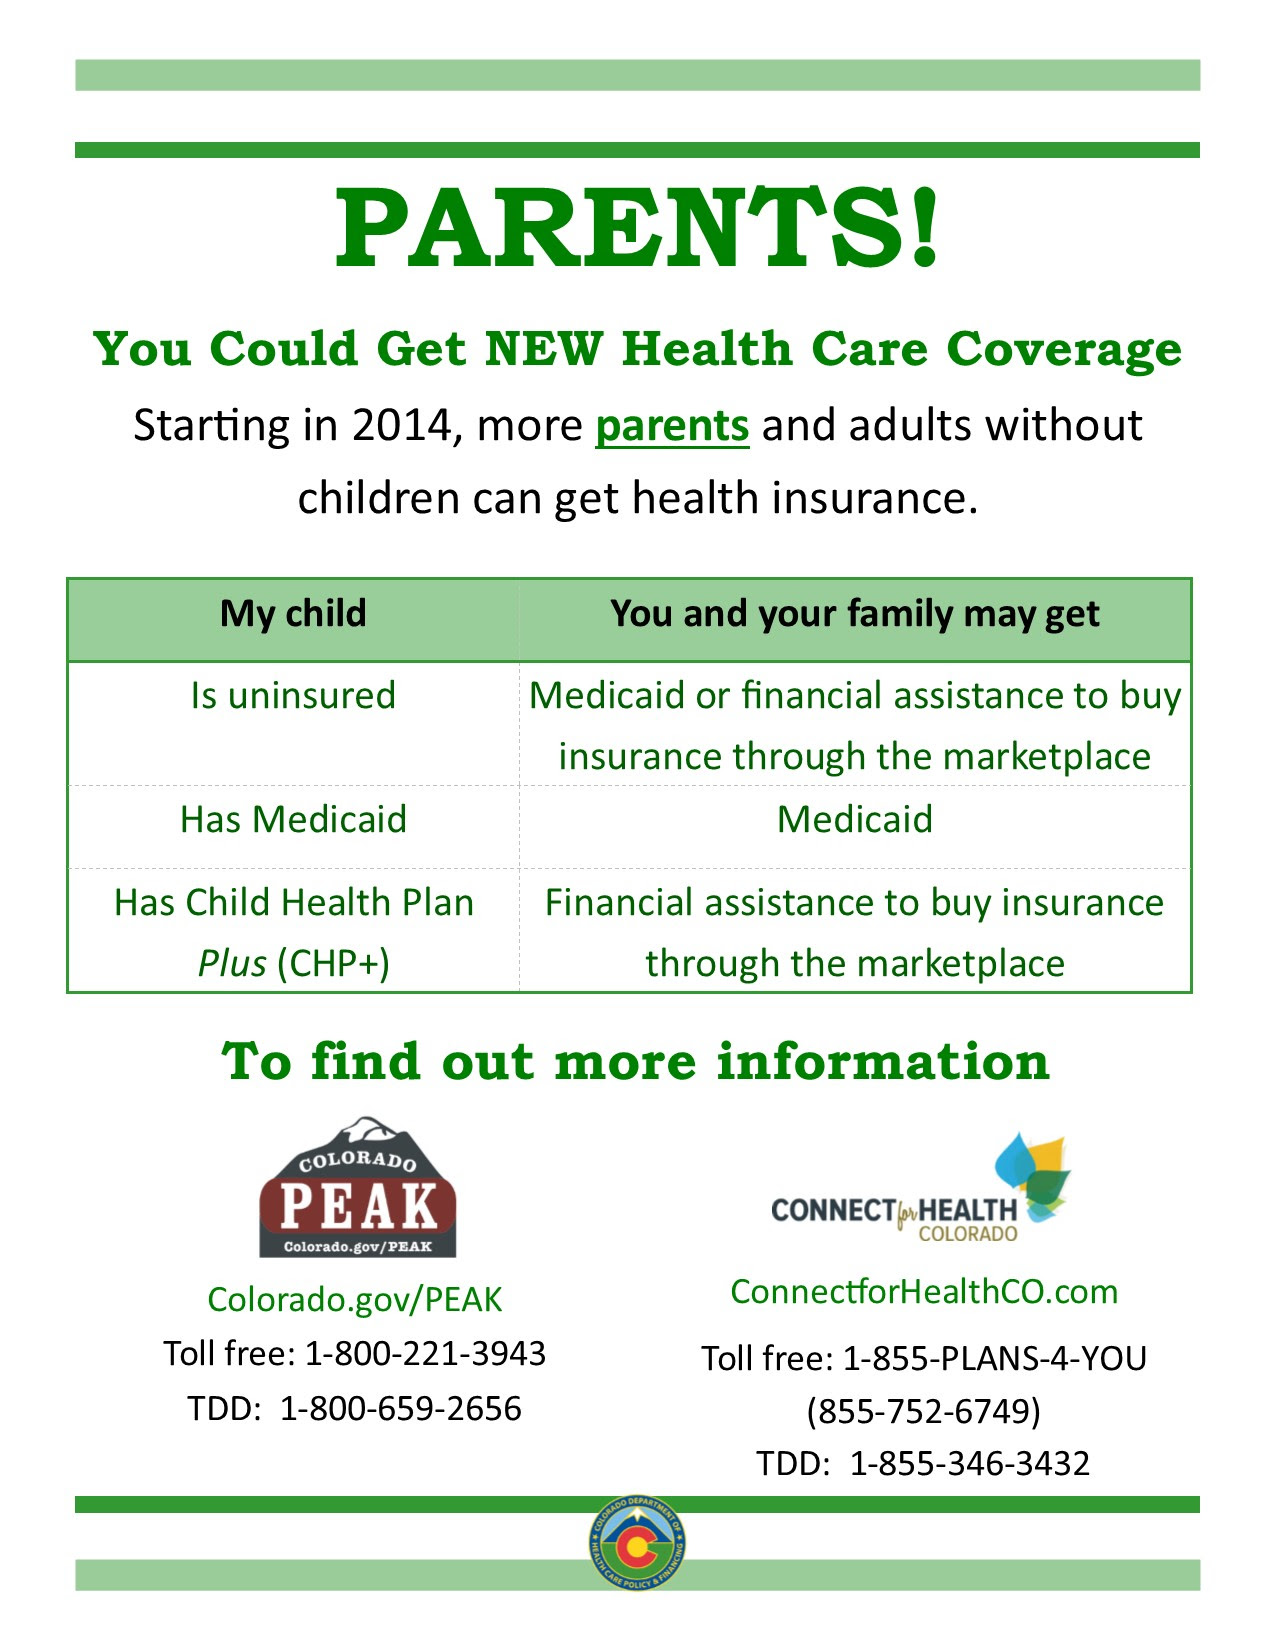 I need health insurance. | colorado.gov/health